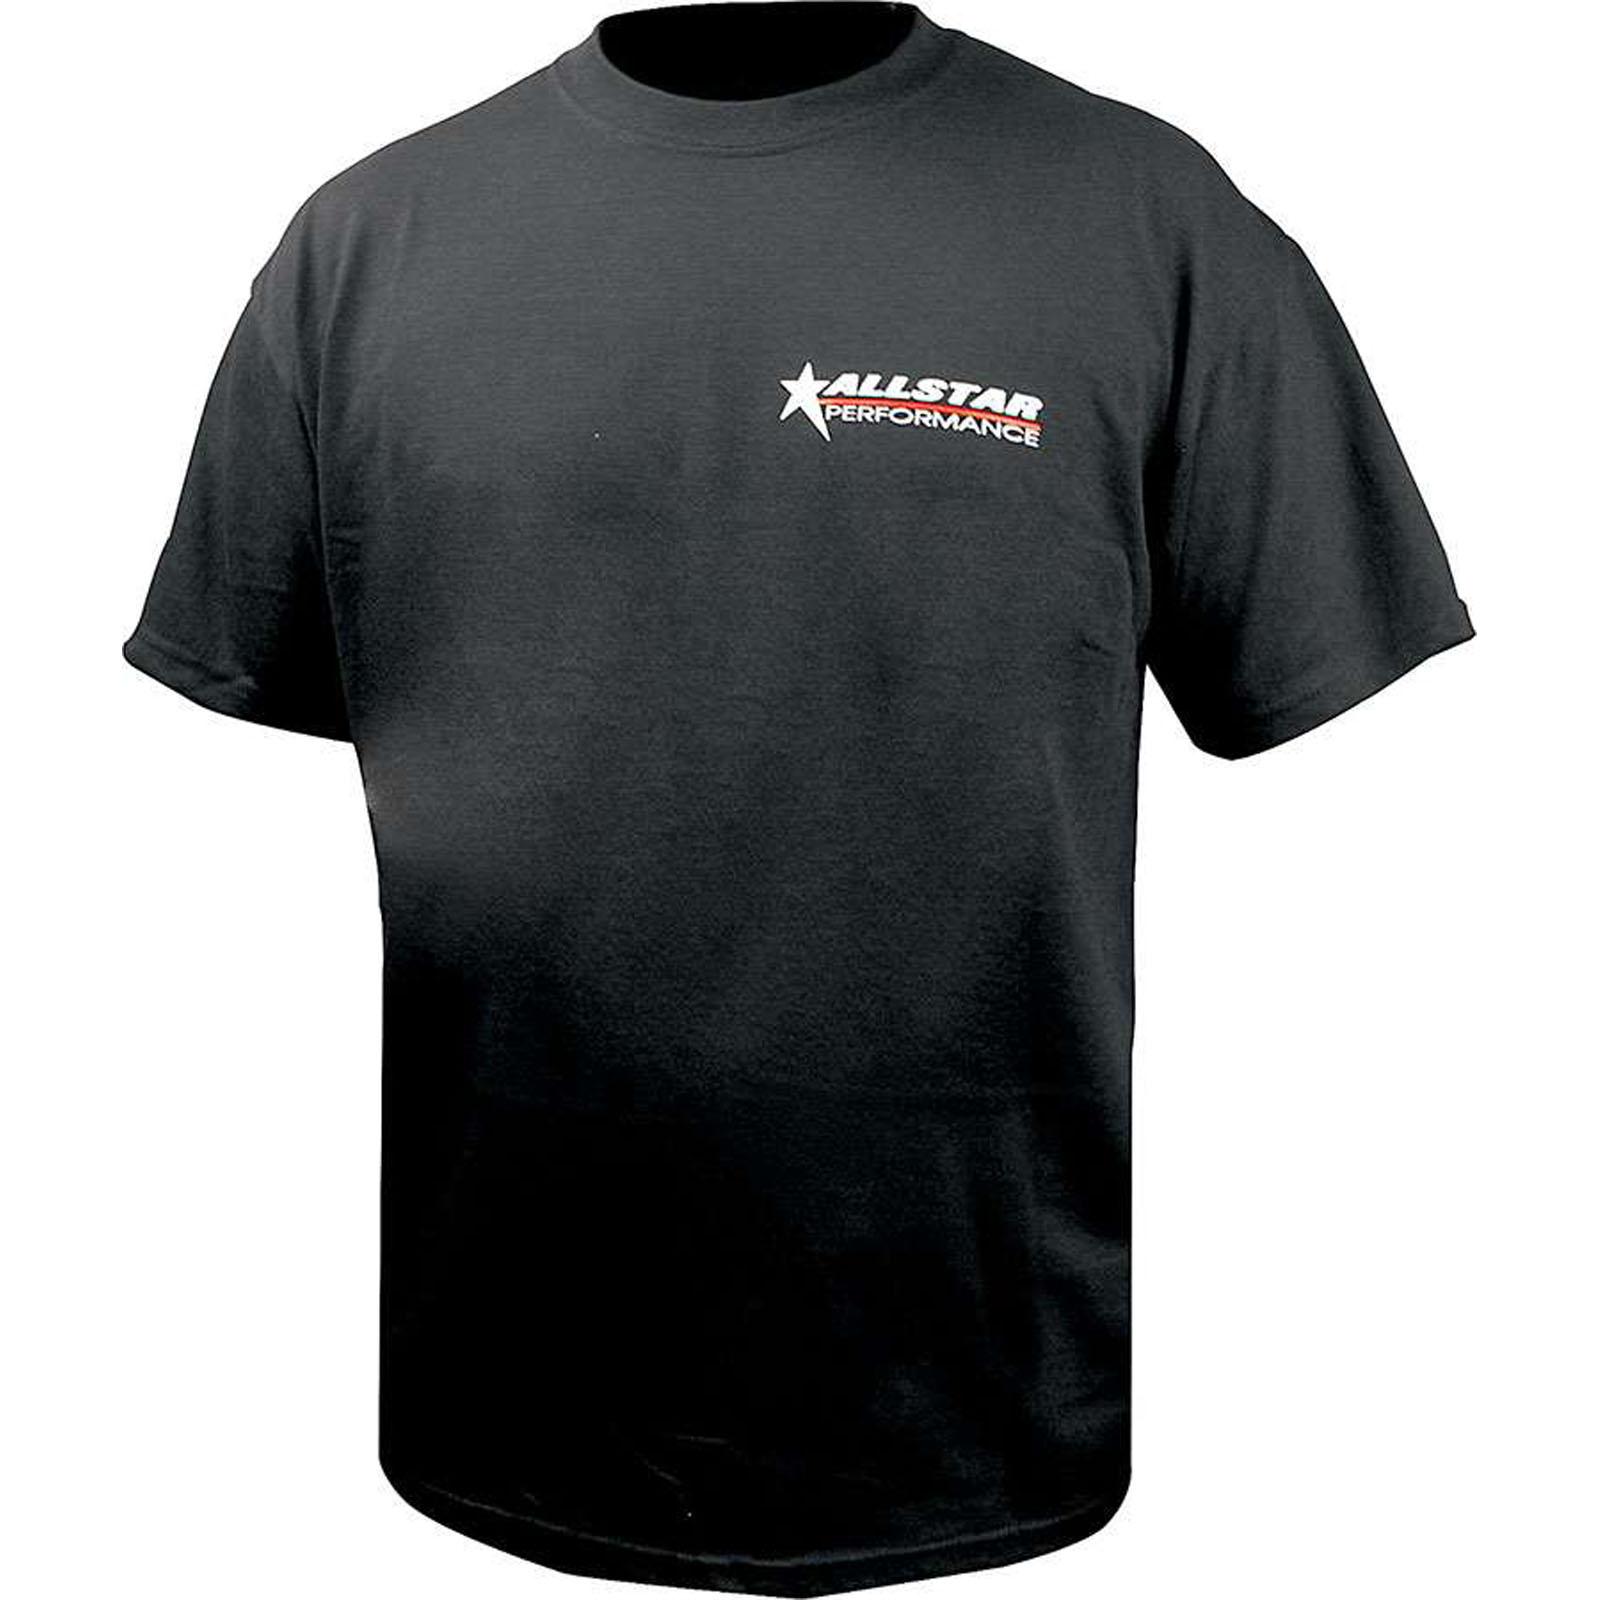 ALLSTAR PERFORMANCE ALL99902YL Allstar T-Shirt Black Youth Large